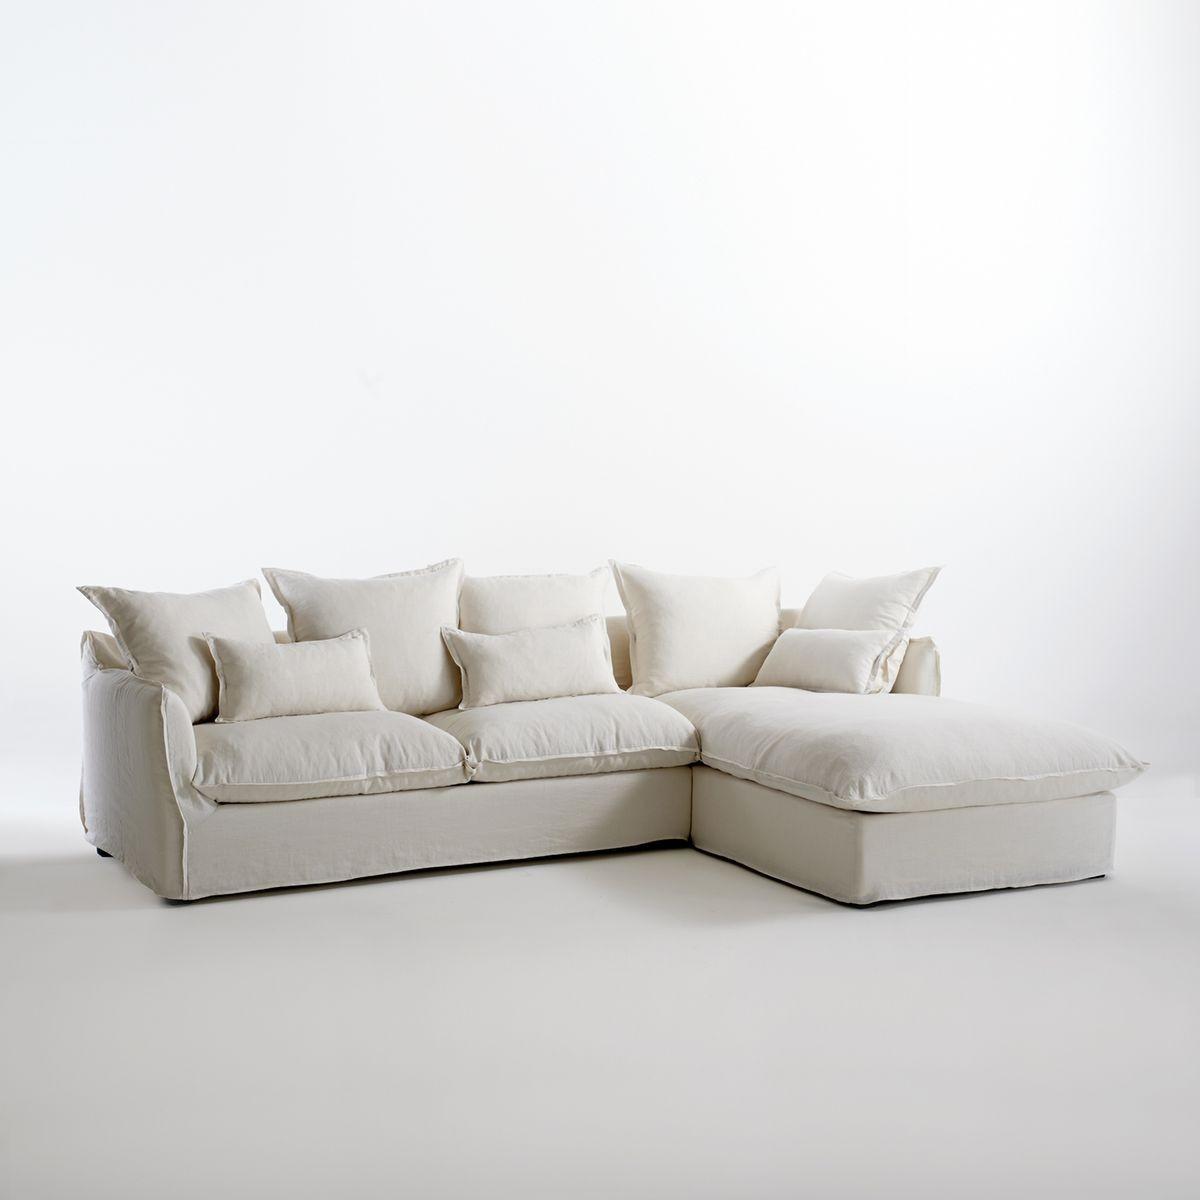 Meuble tv conforama meuble tv namur coloris d cor for Canape angle la redoute